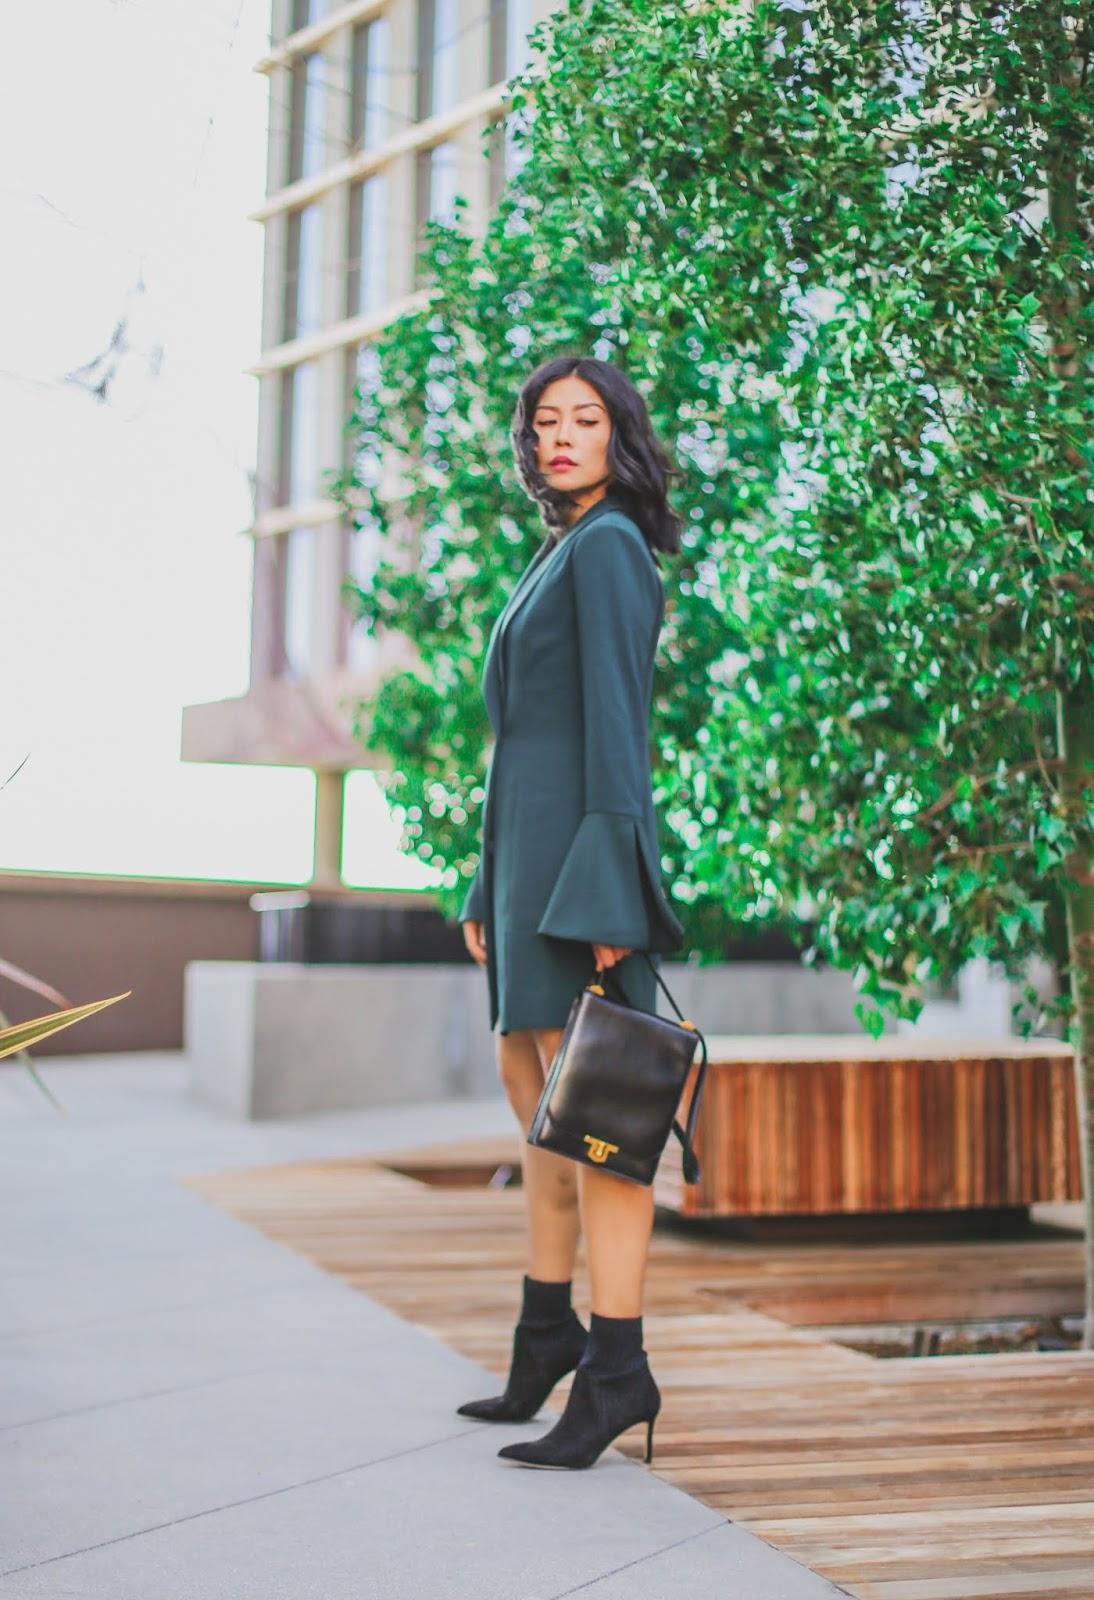 girl boss outfit inspo